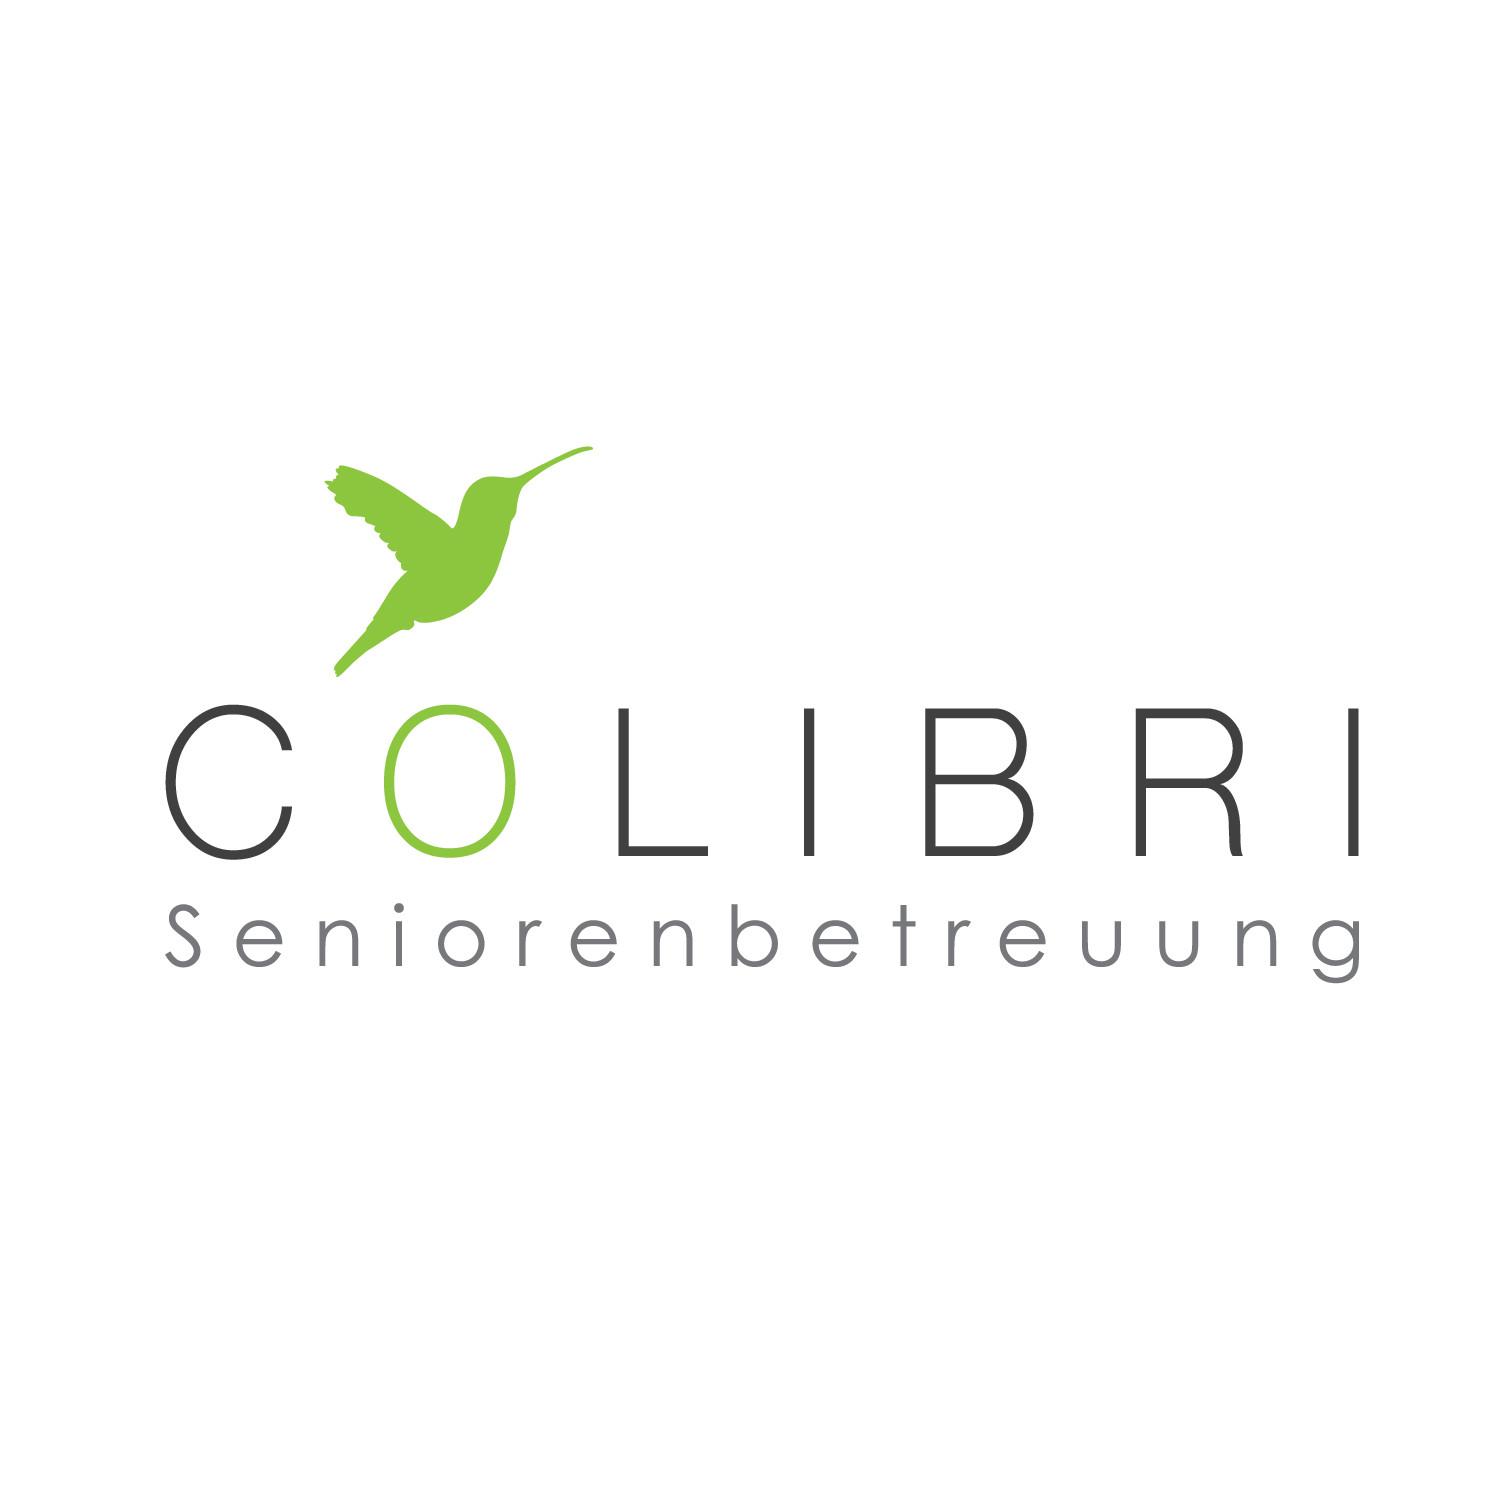 Logo COLIBRI Seniorenbetreuung GmbH